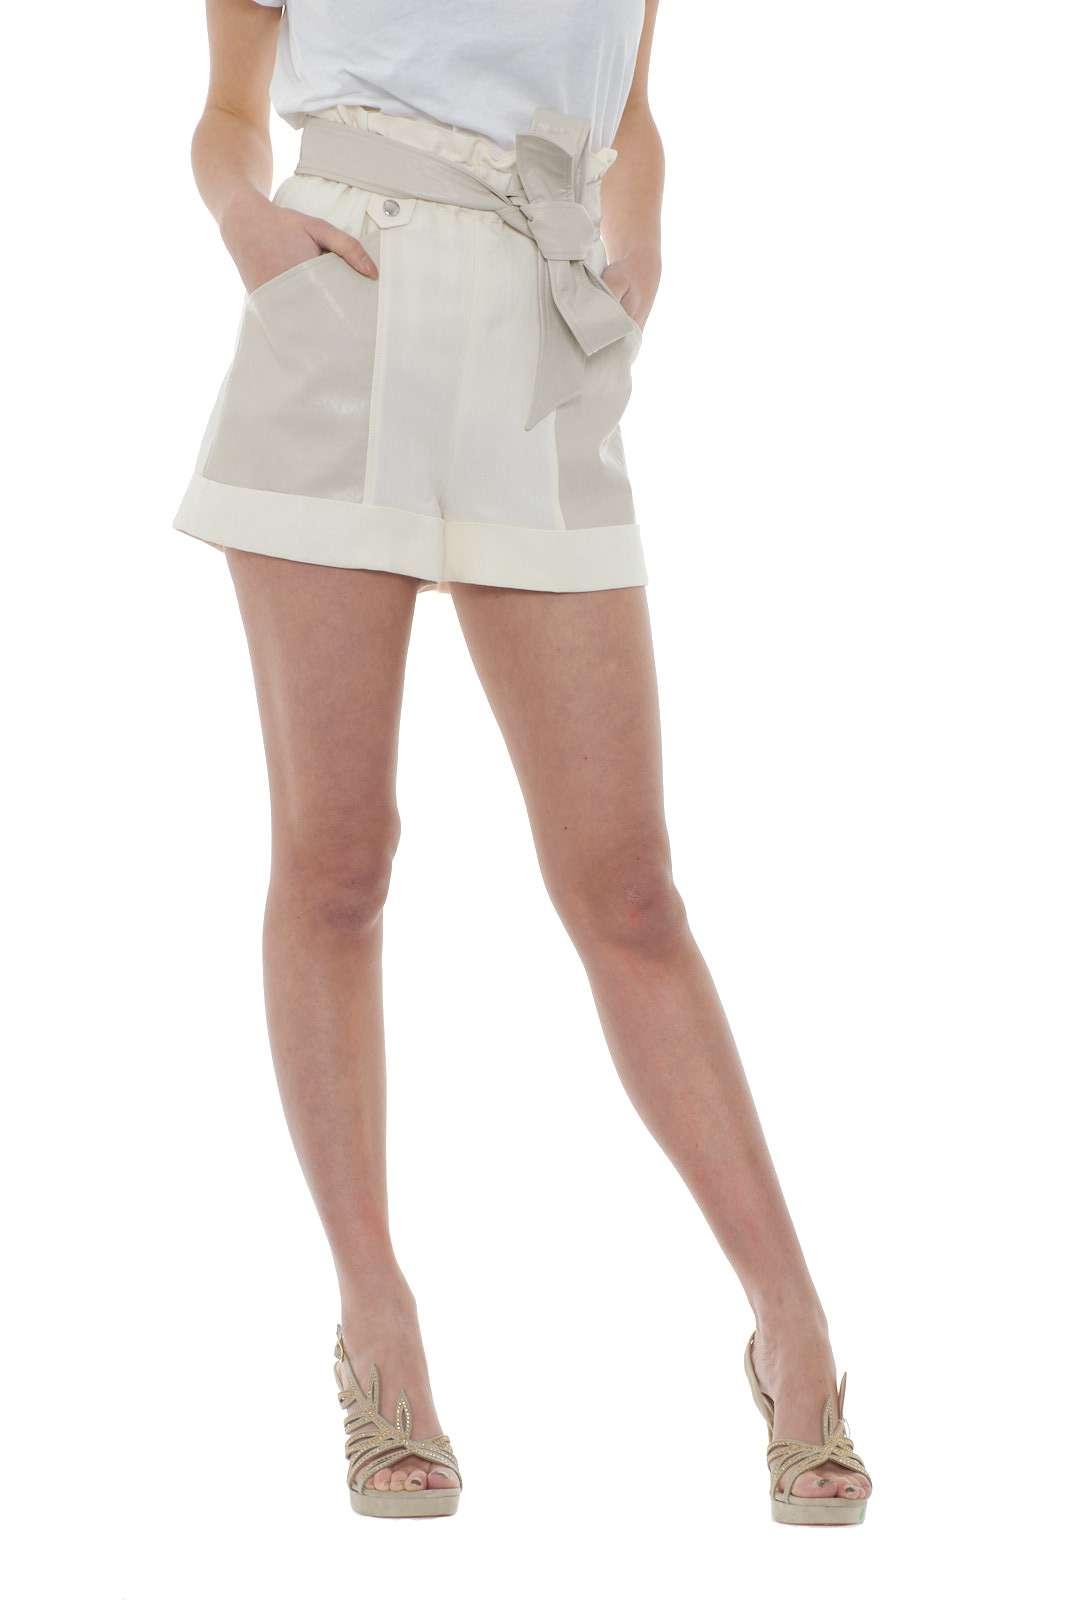 https://www.parmax.com/media/catalog/product/a/i/PE-outlet_parmax-shorts-donna-TwinSet-201TT2213-A.jpg